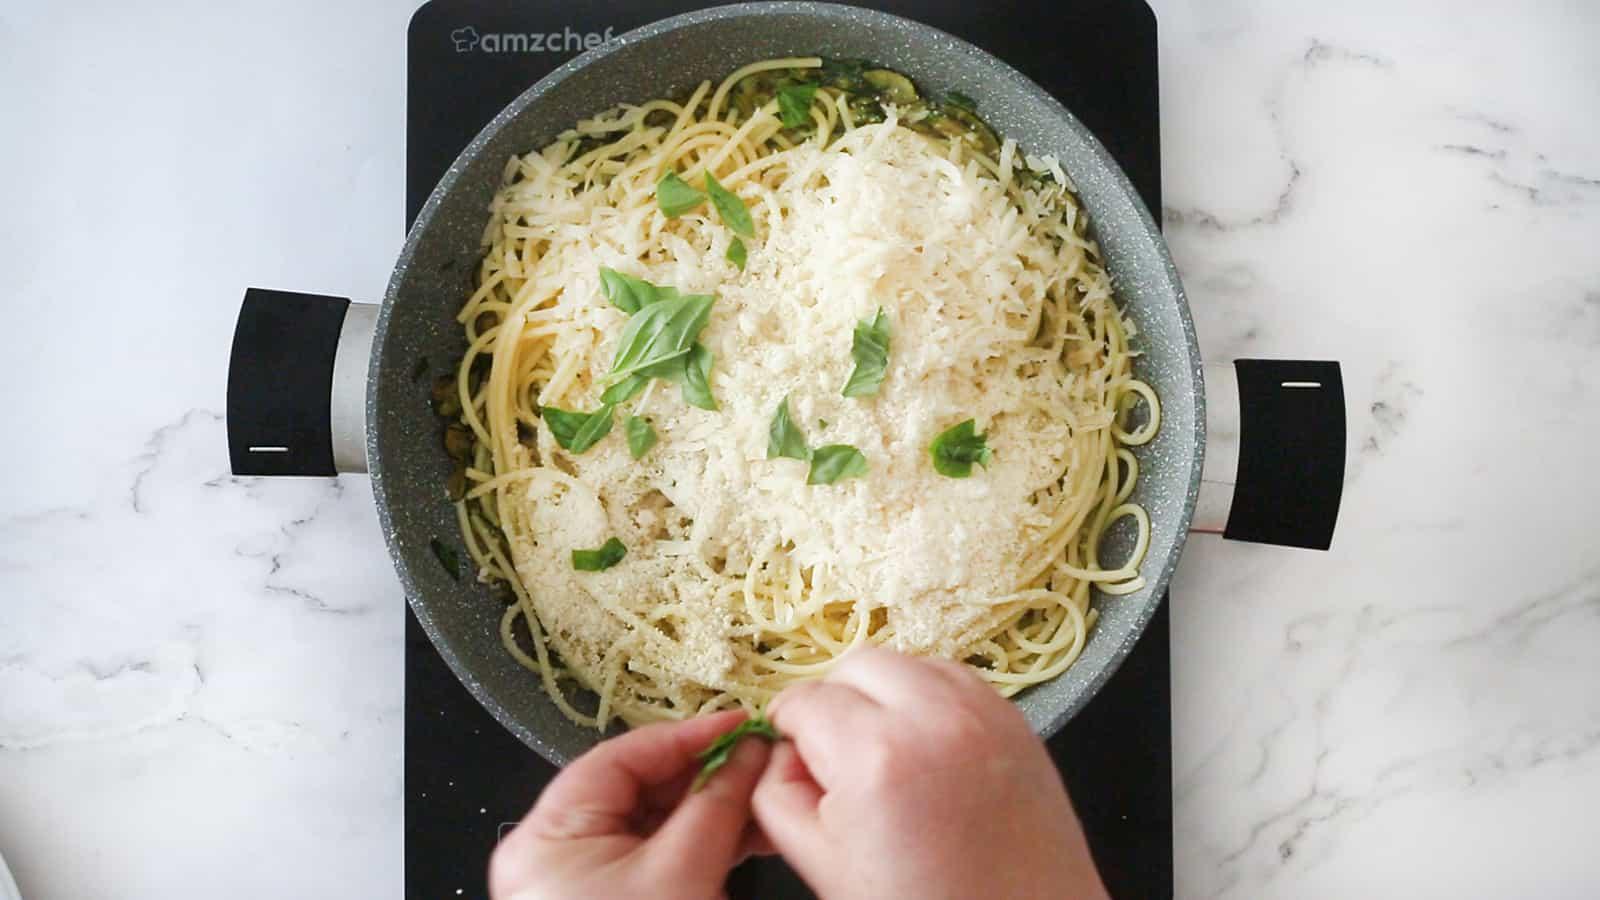 Adding hand-torn basil to the pan.